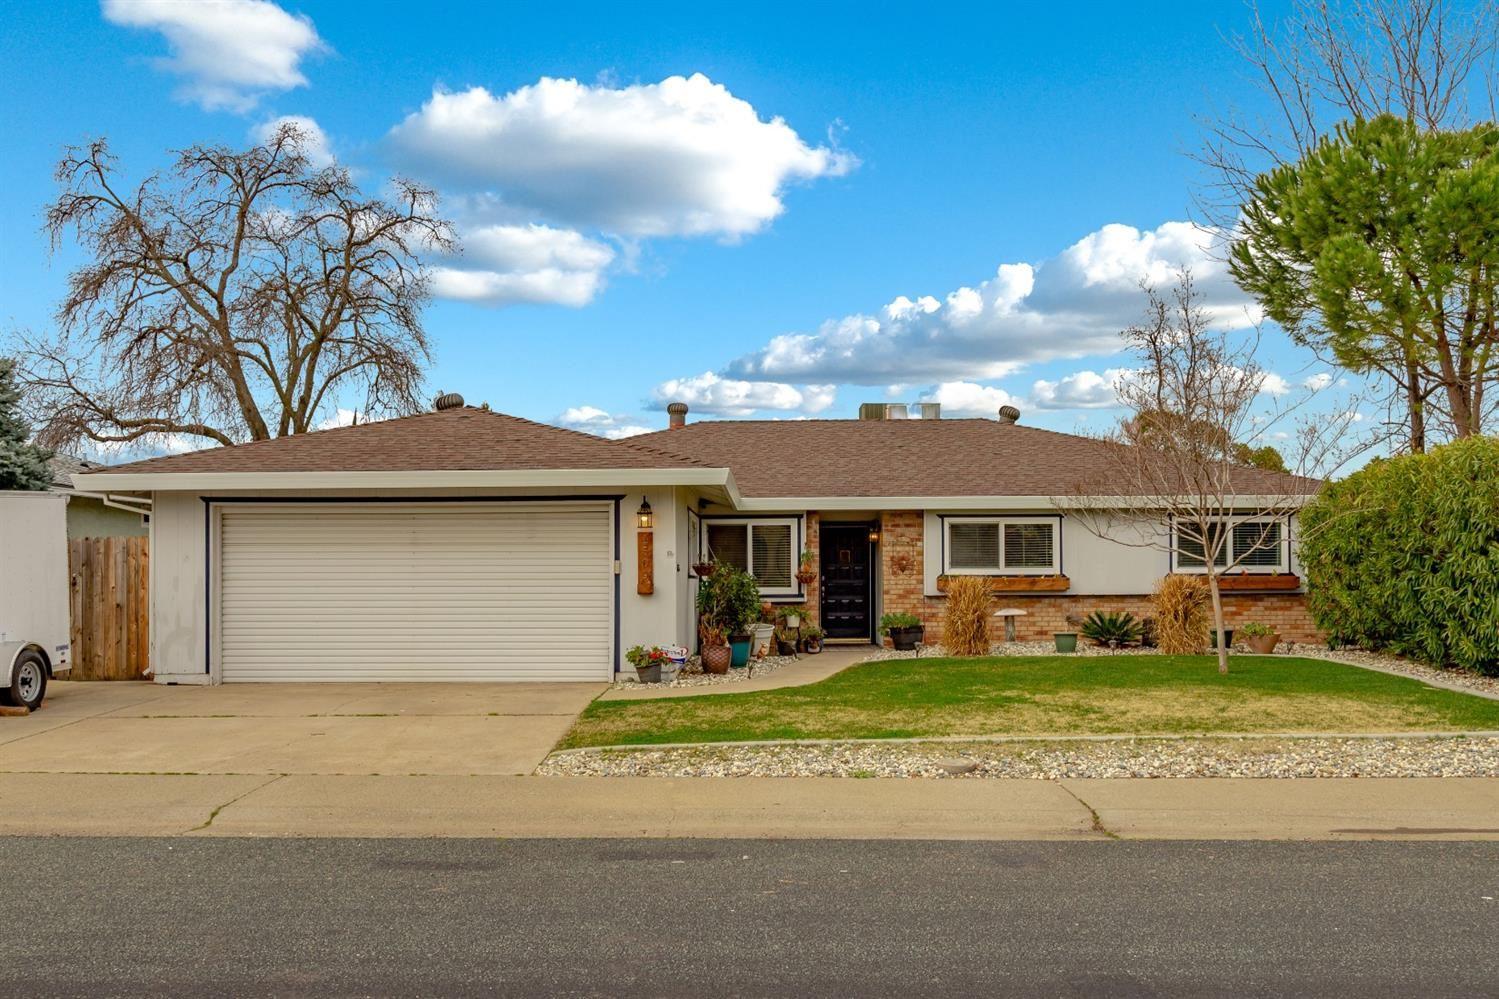 Photo of 1509 Swallow Way, Roseville, CA 95661 (MLS # 221011059)